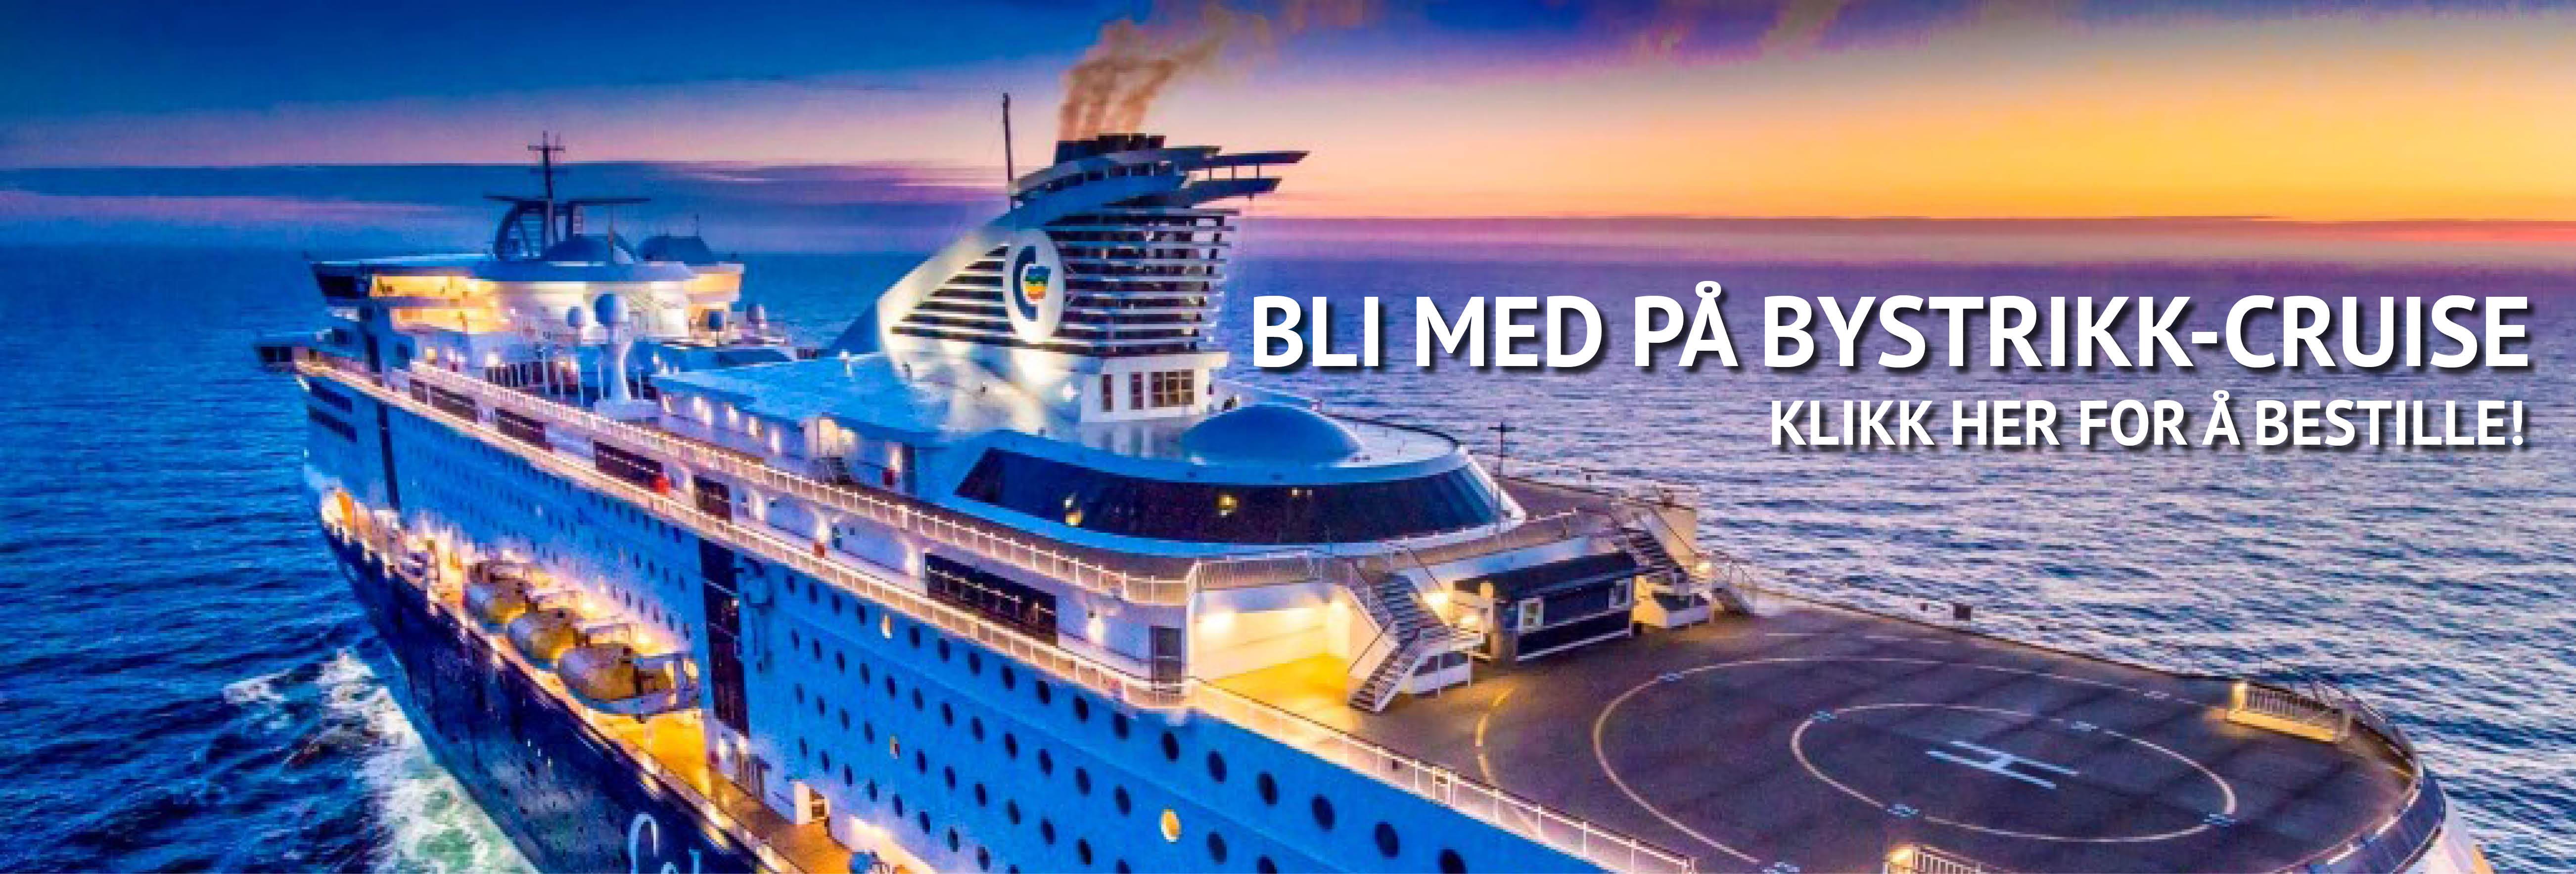 Bystrikk-cruise